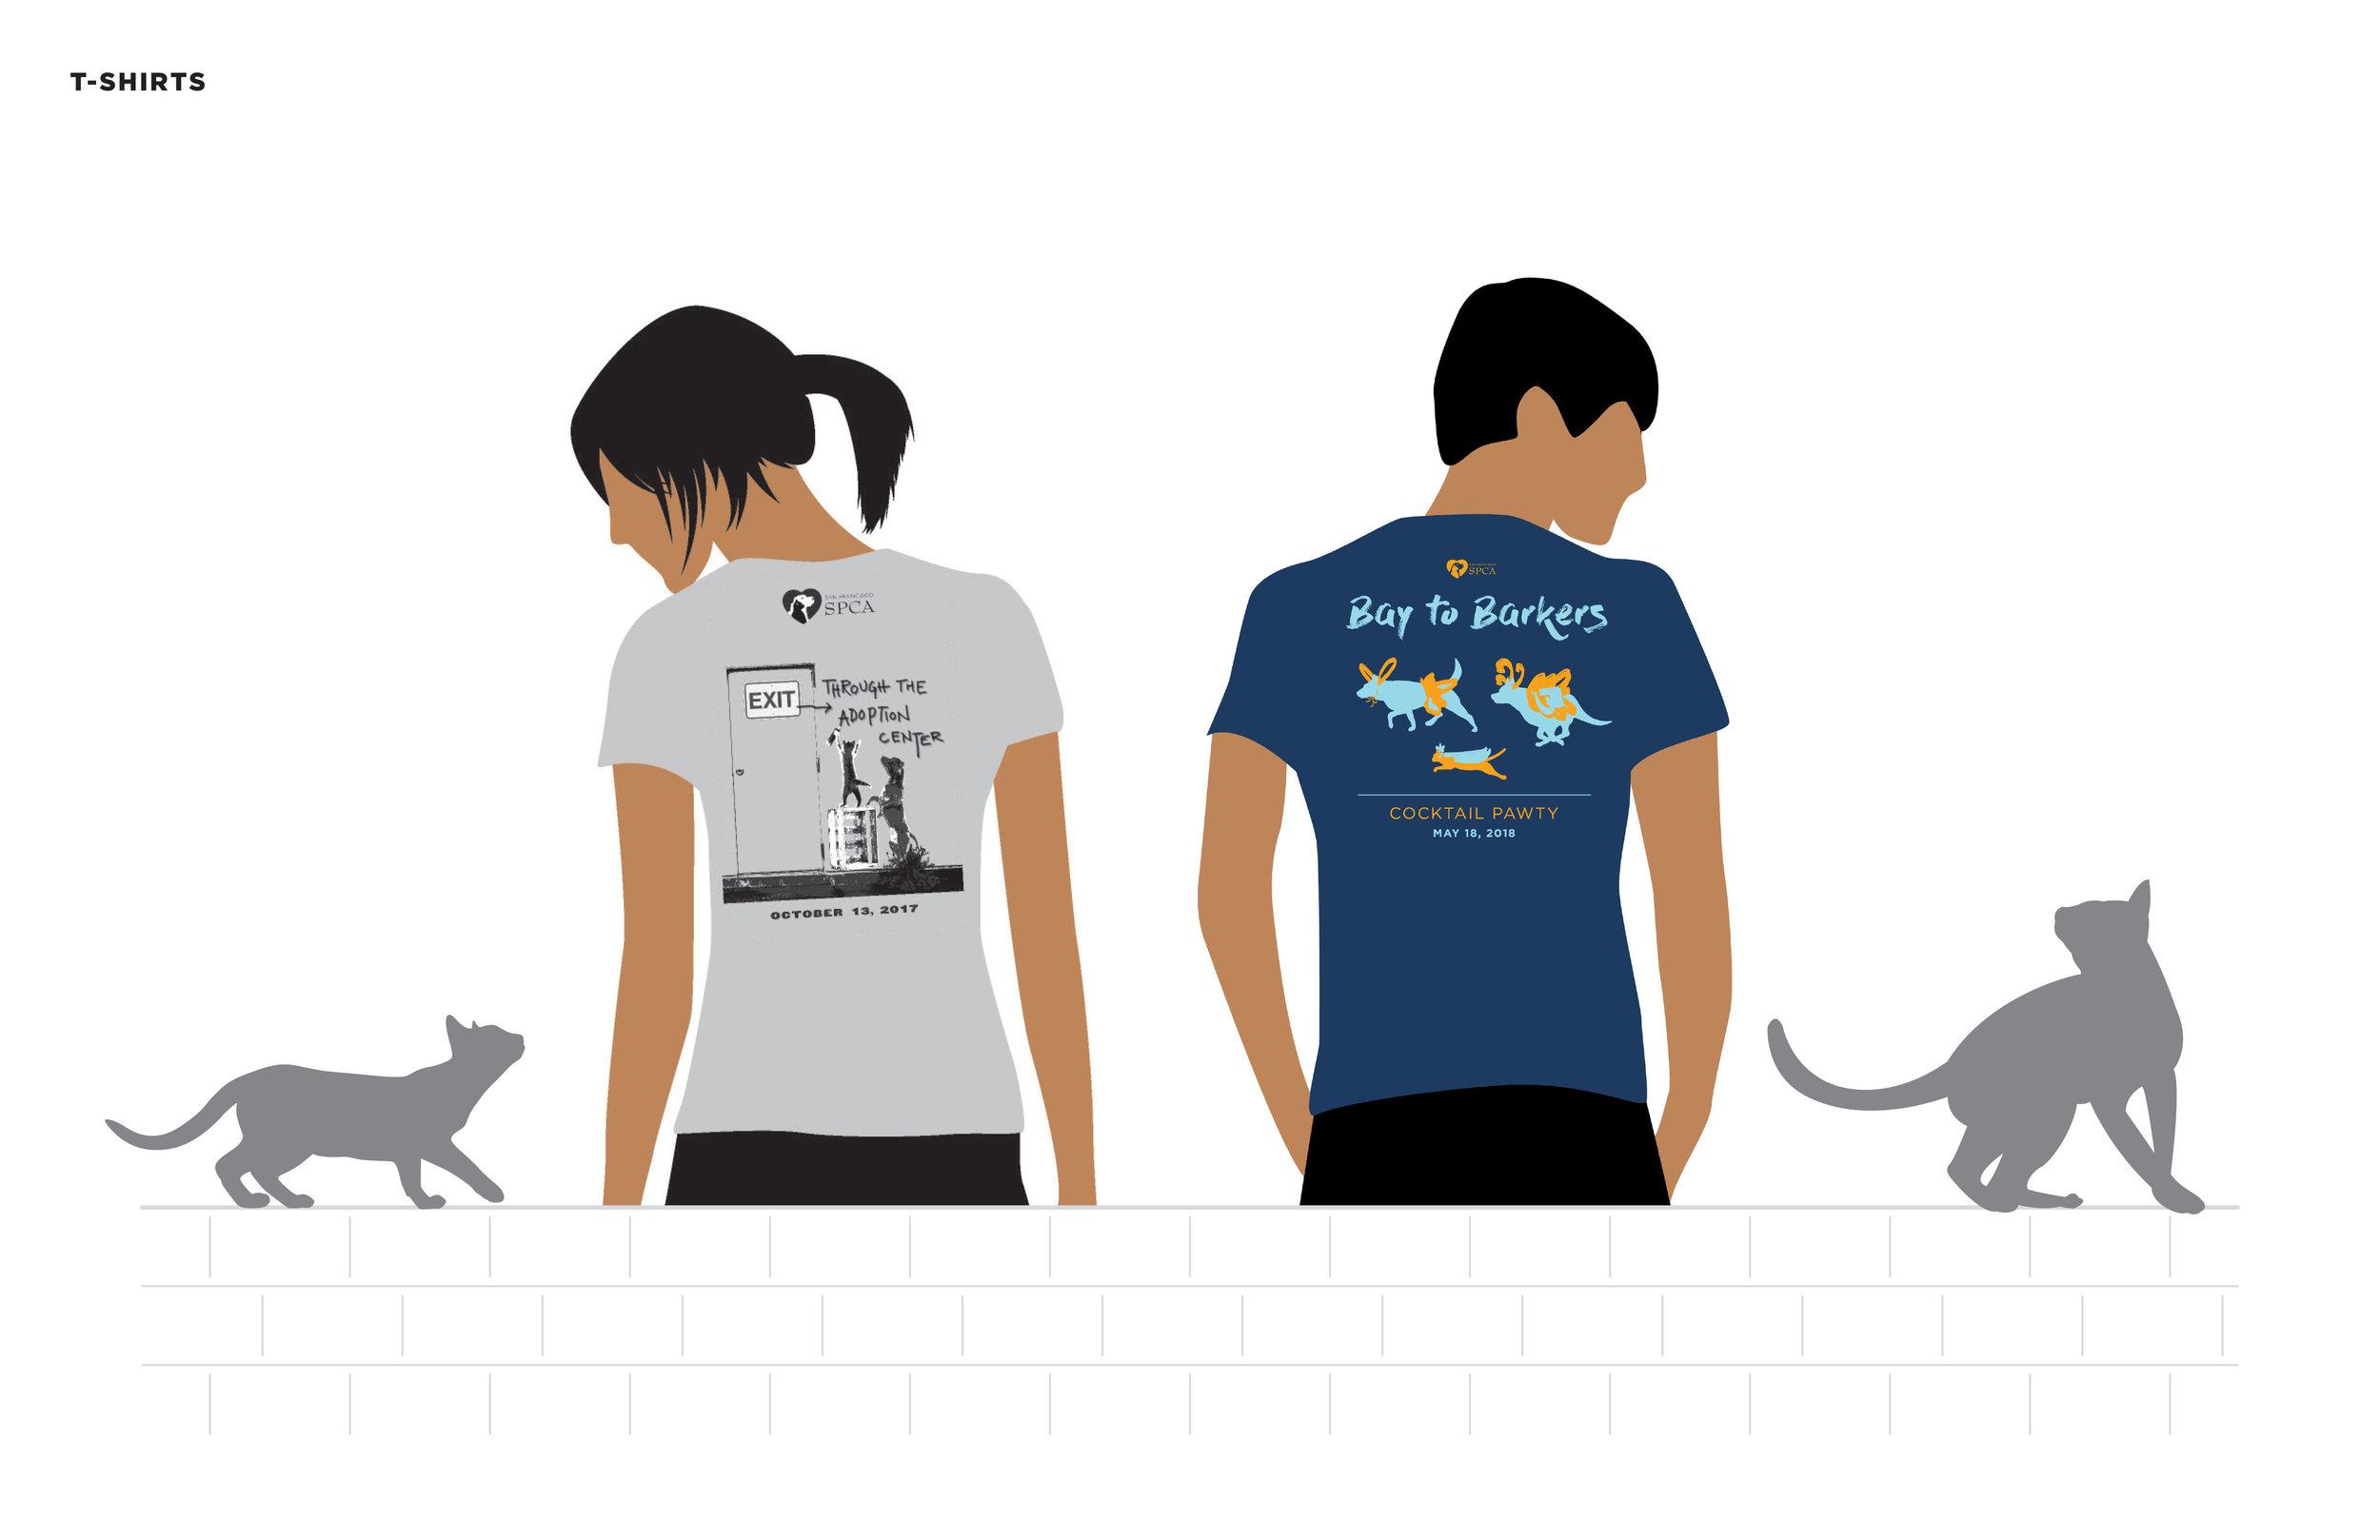 SPCA_shirts.jpg